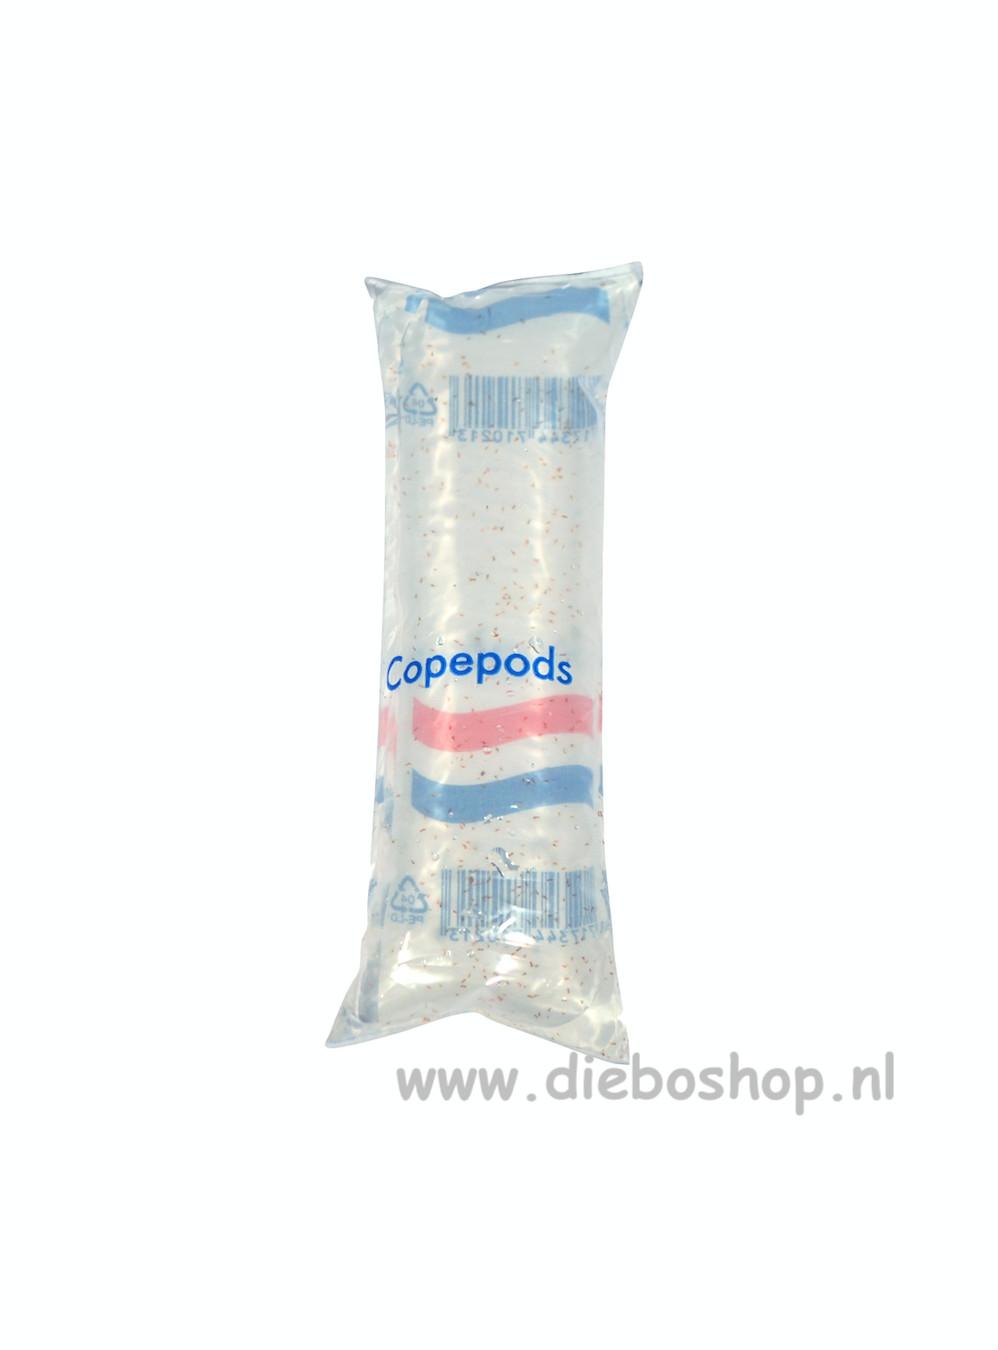 Aquadip Levende Copepods